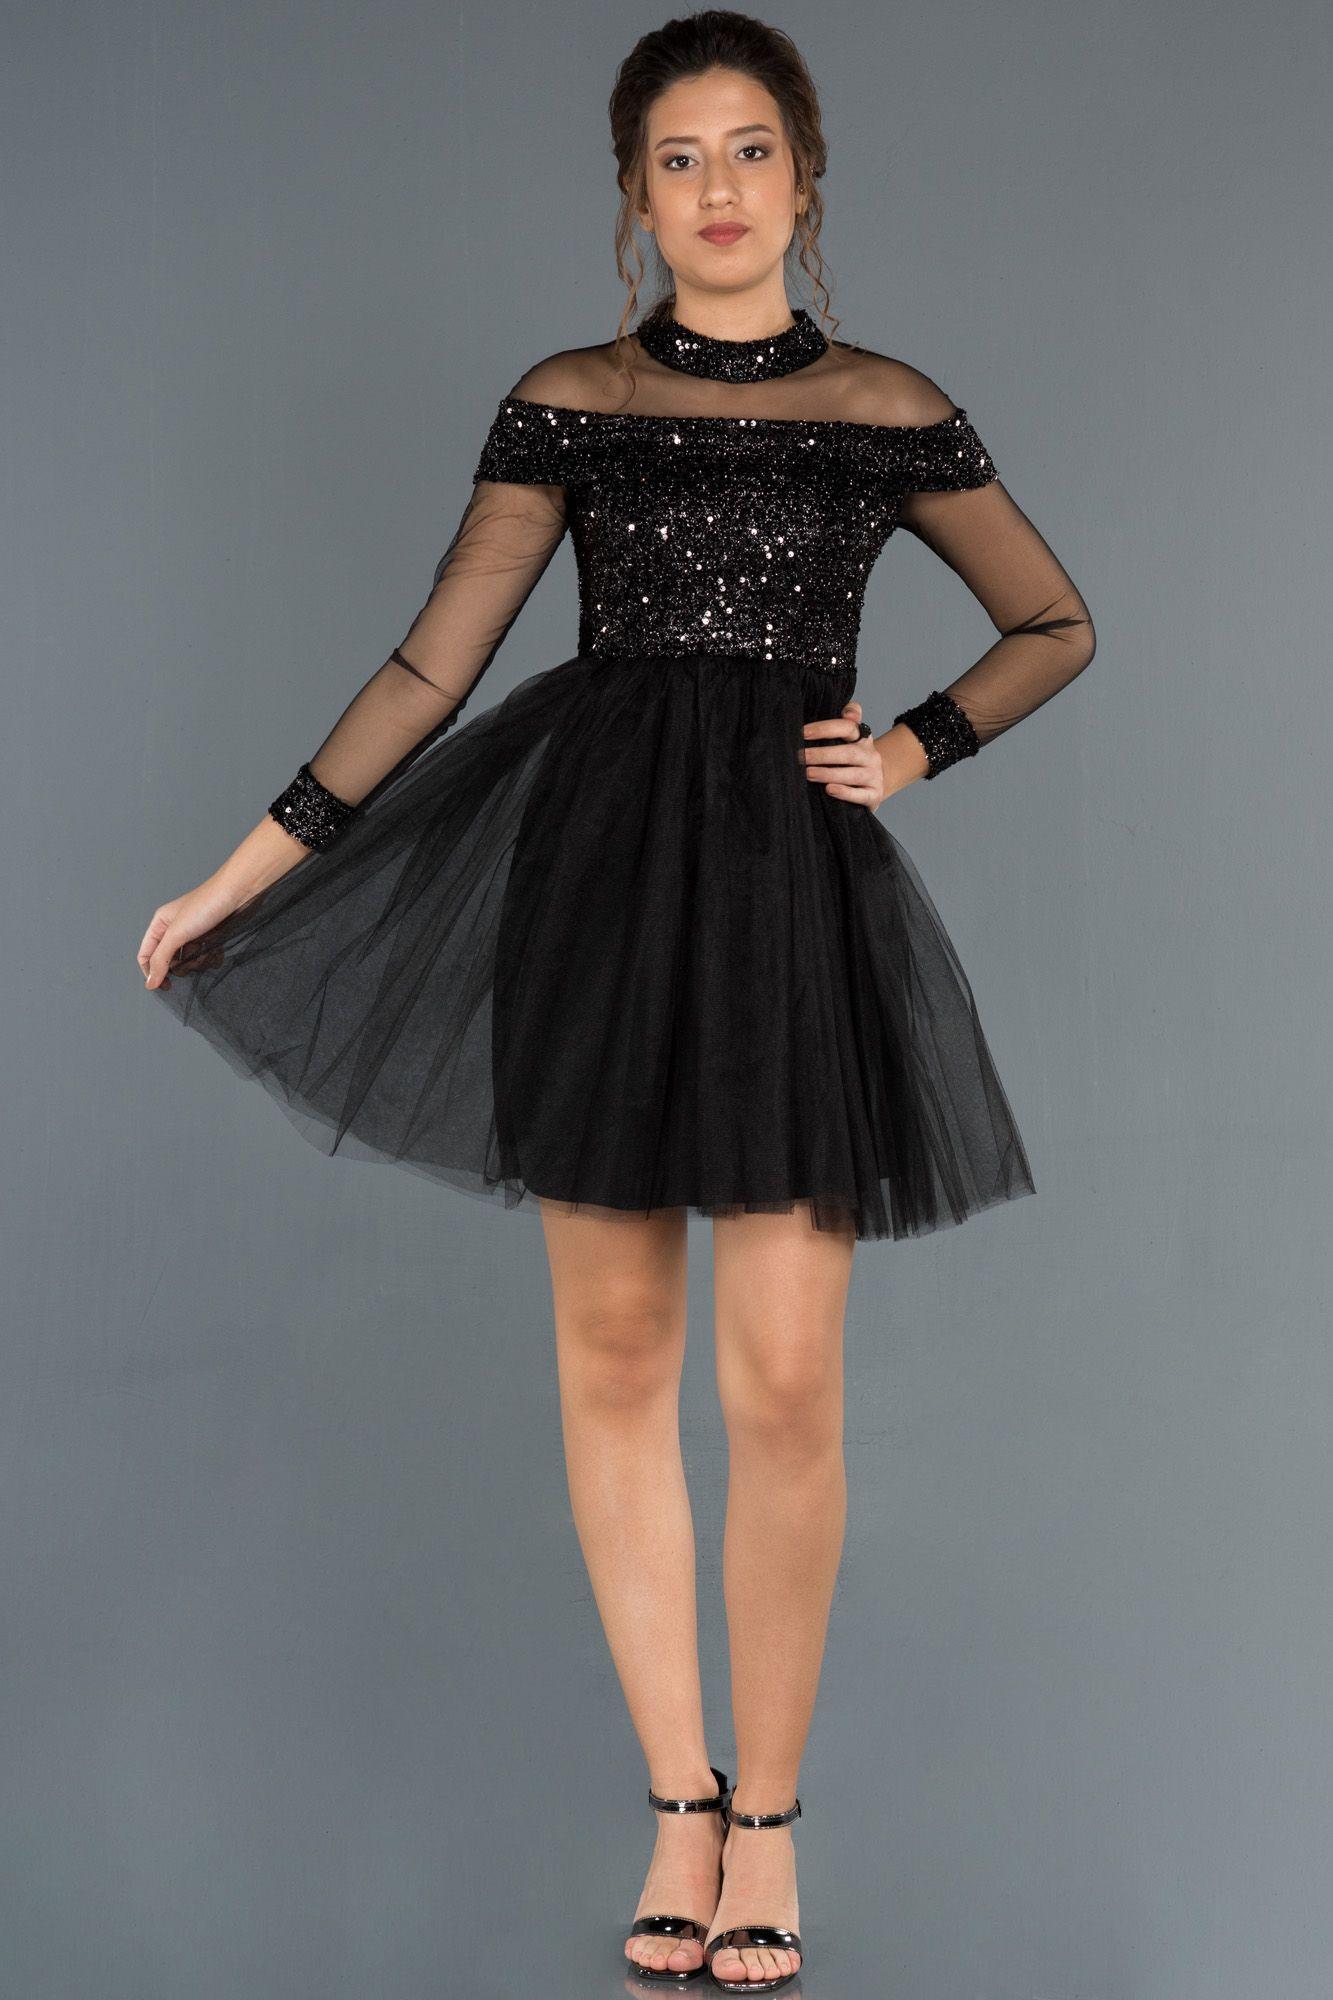 Siyah Kisa Pul Payet Detayli Tul Abiye Abk799 2020 The Dress Moda Stilleri Elbise